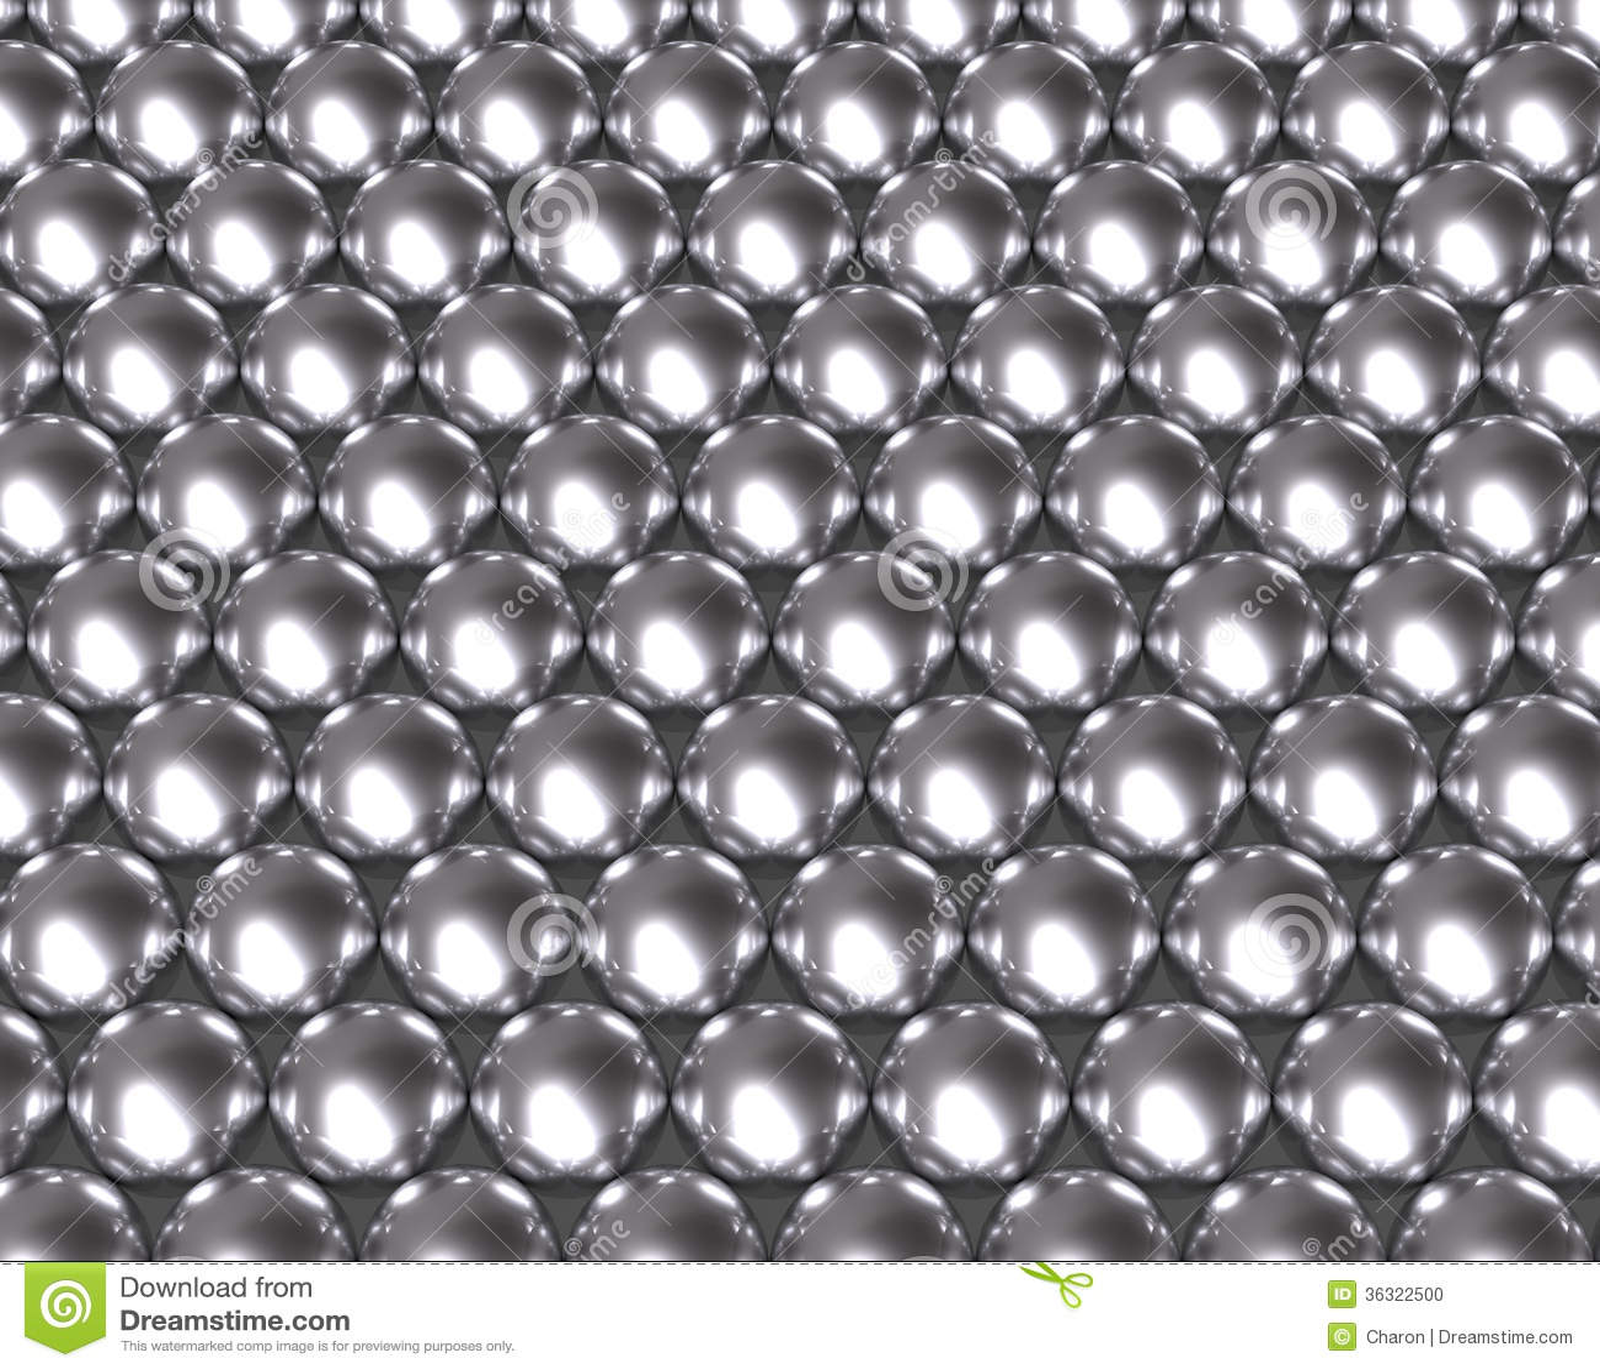 Silver Balls Pattern Reflective Texture Stock Photo